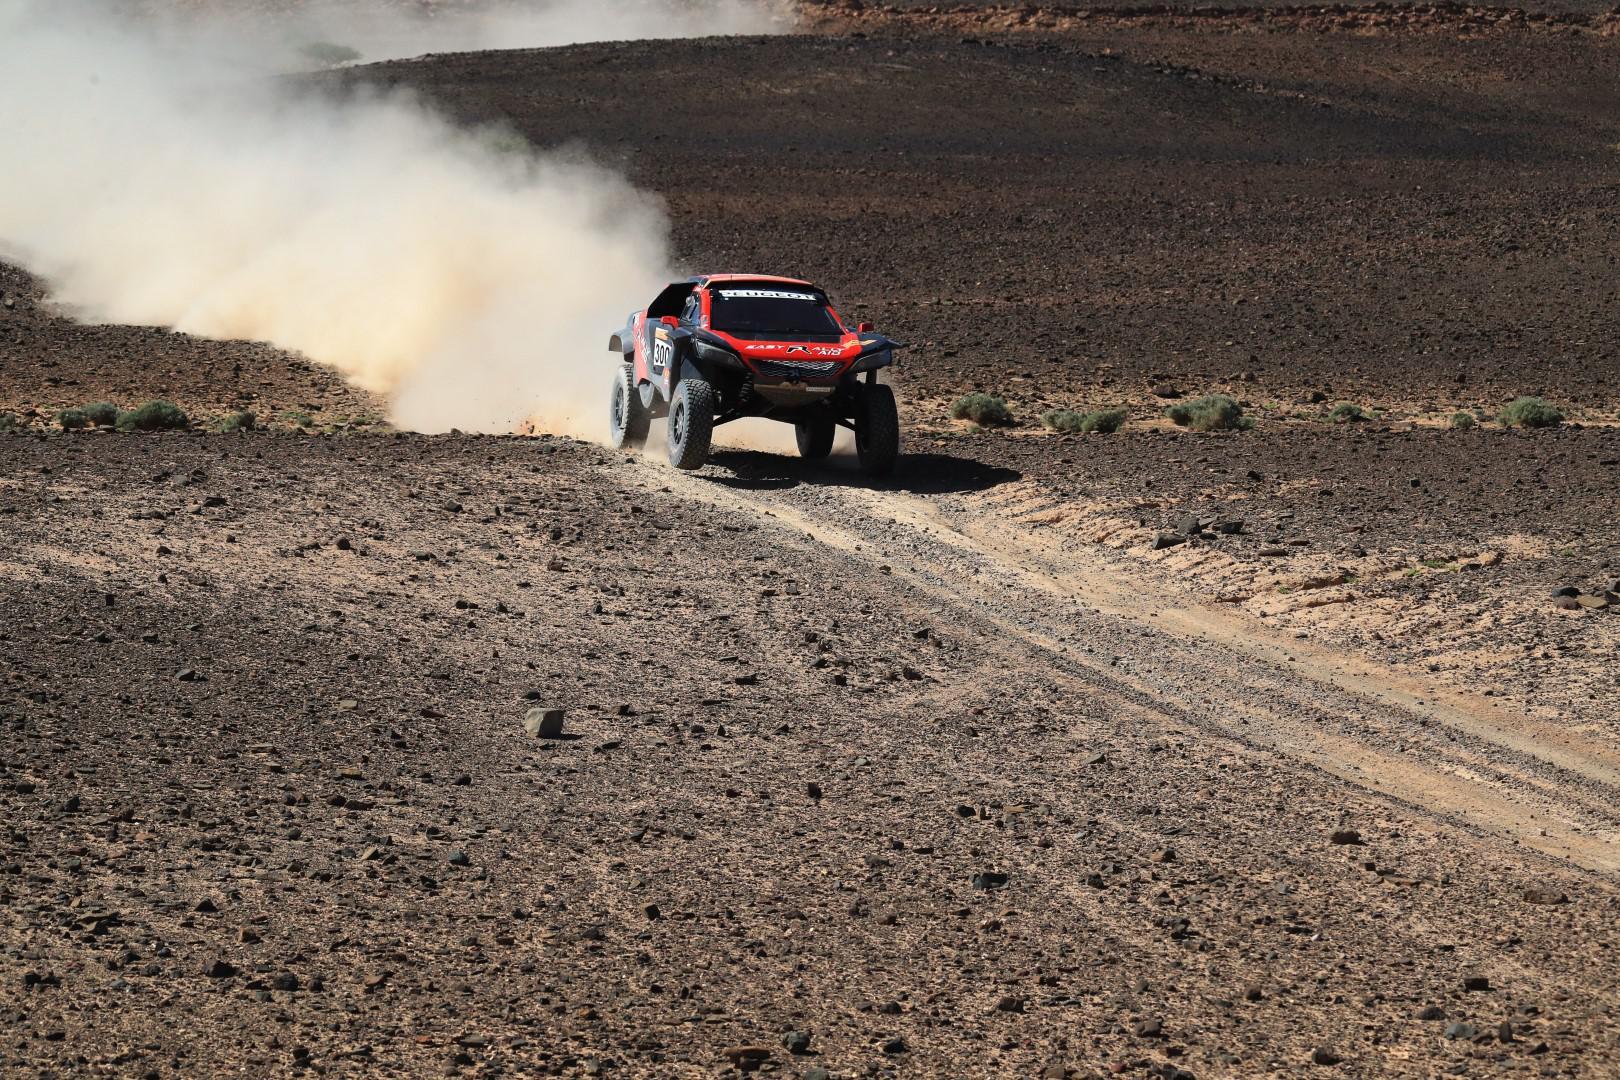 dakar-2019-jean-pascal-besson-affronte-le-desert-du-perou-922-6.jpg